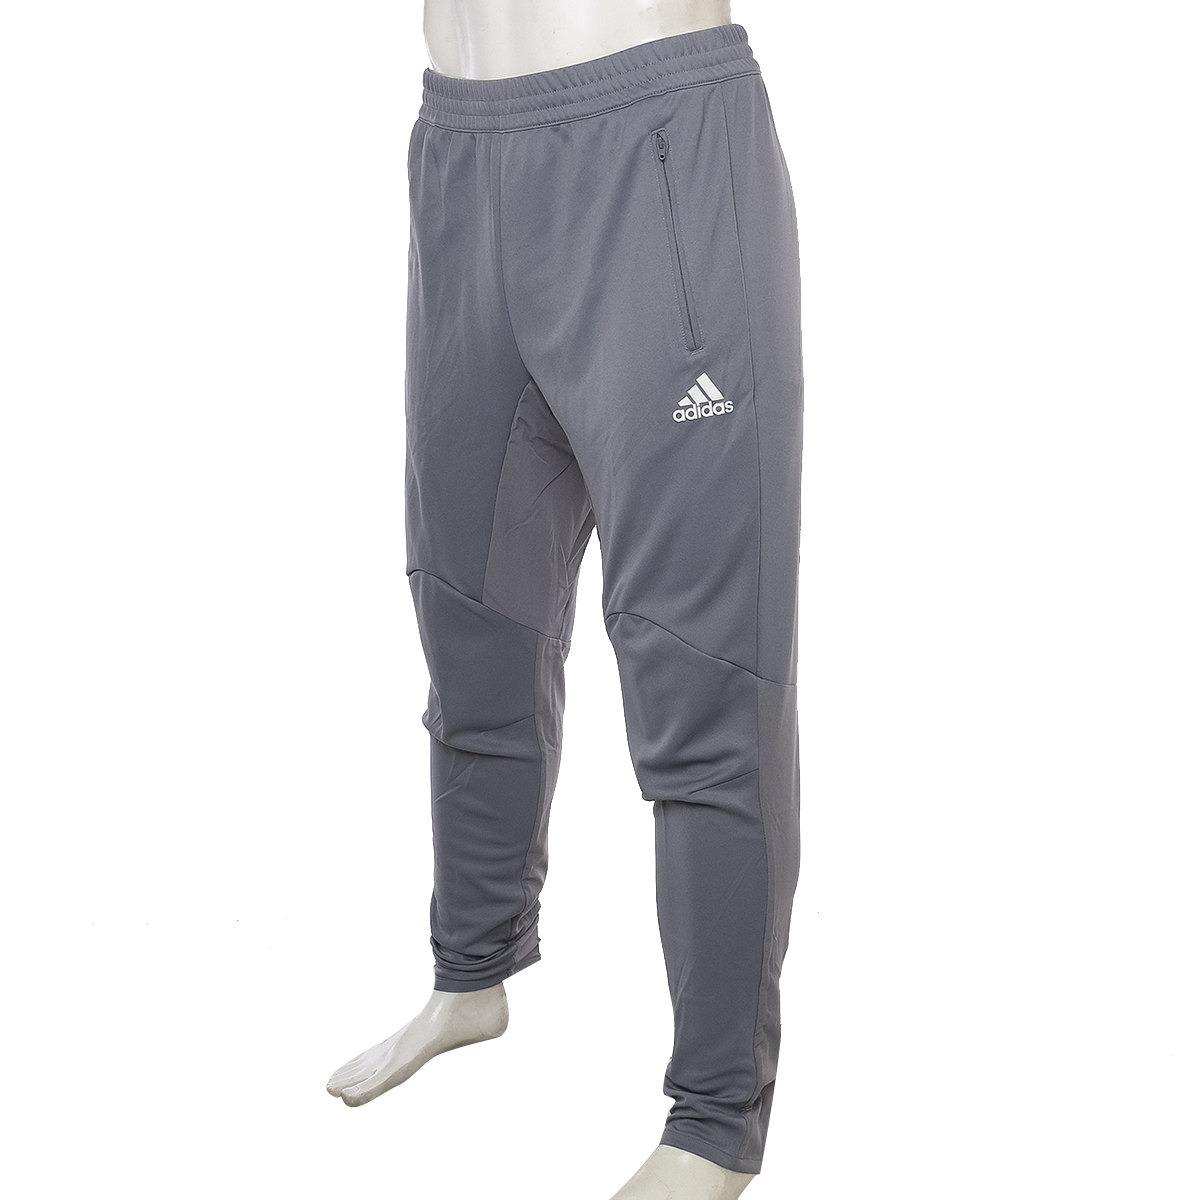 1 Tango 190 Pantalon Future Oficial Adidas Grey Tienda 00 SqZYzwx